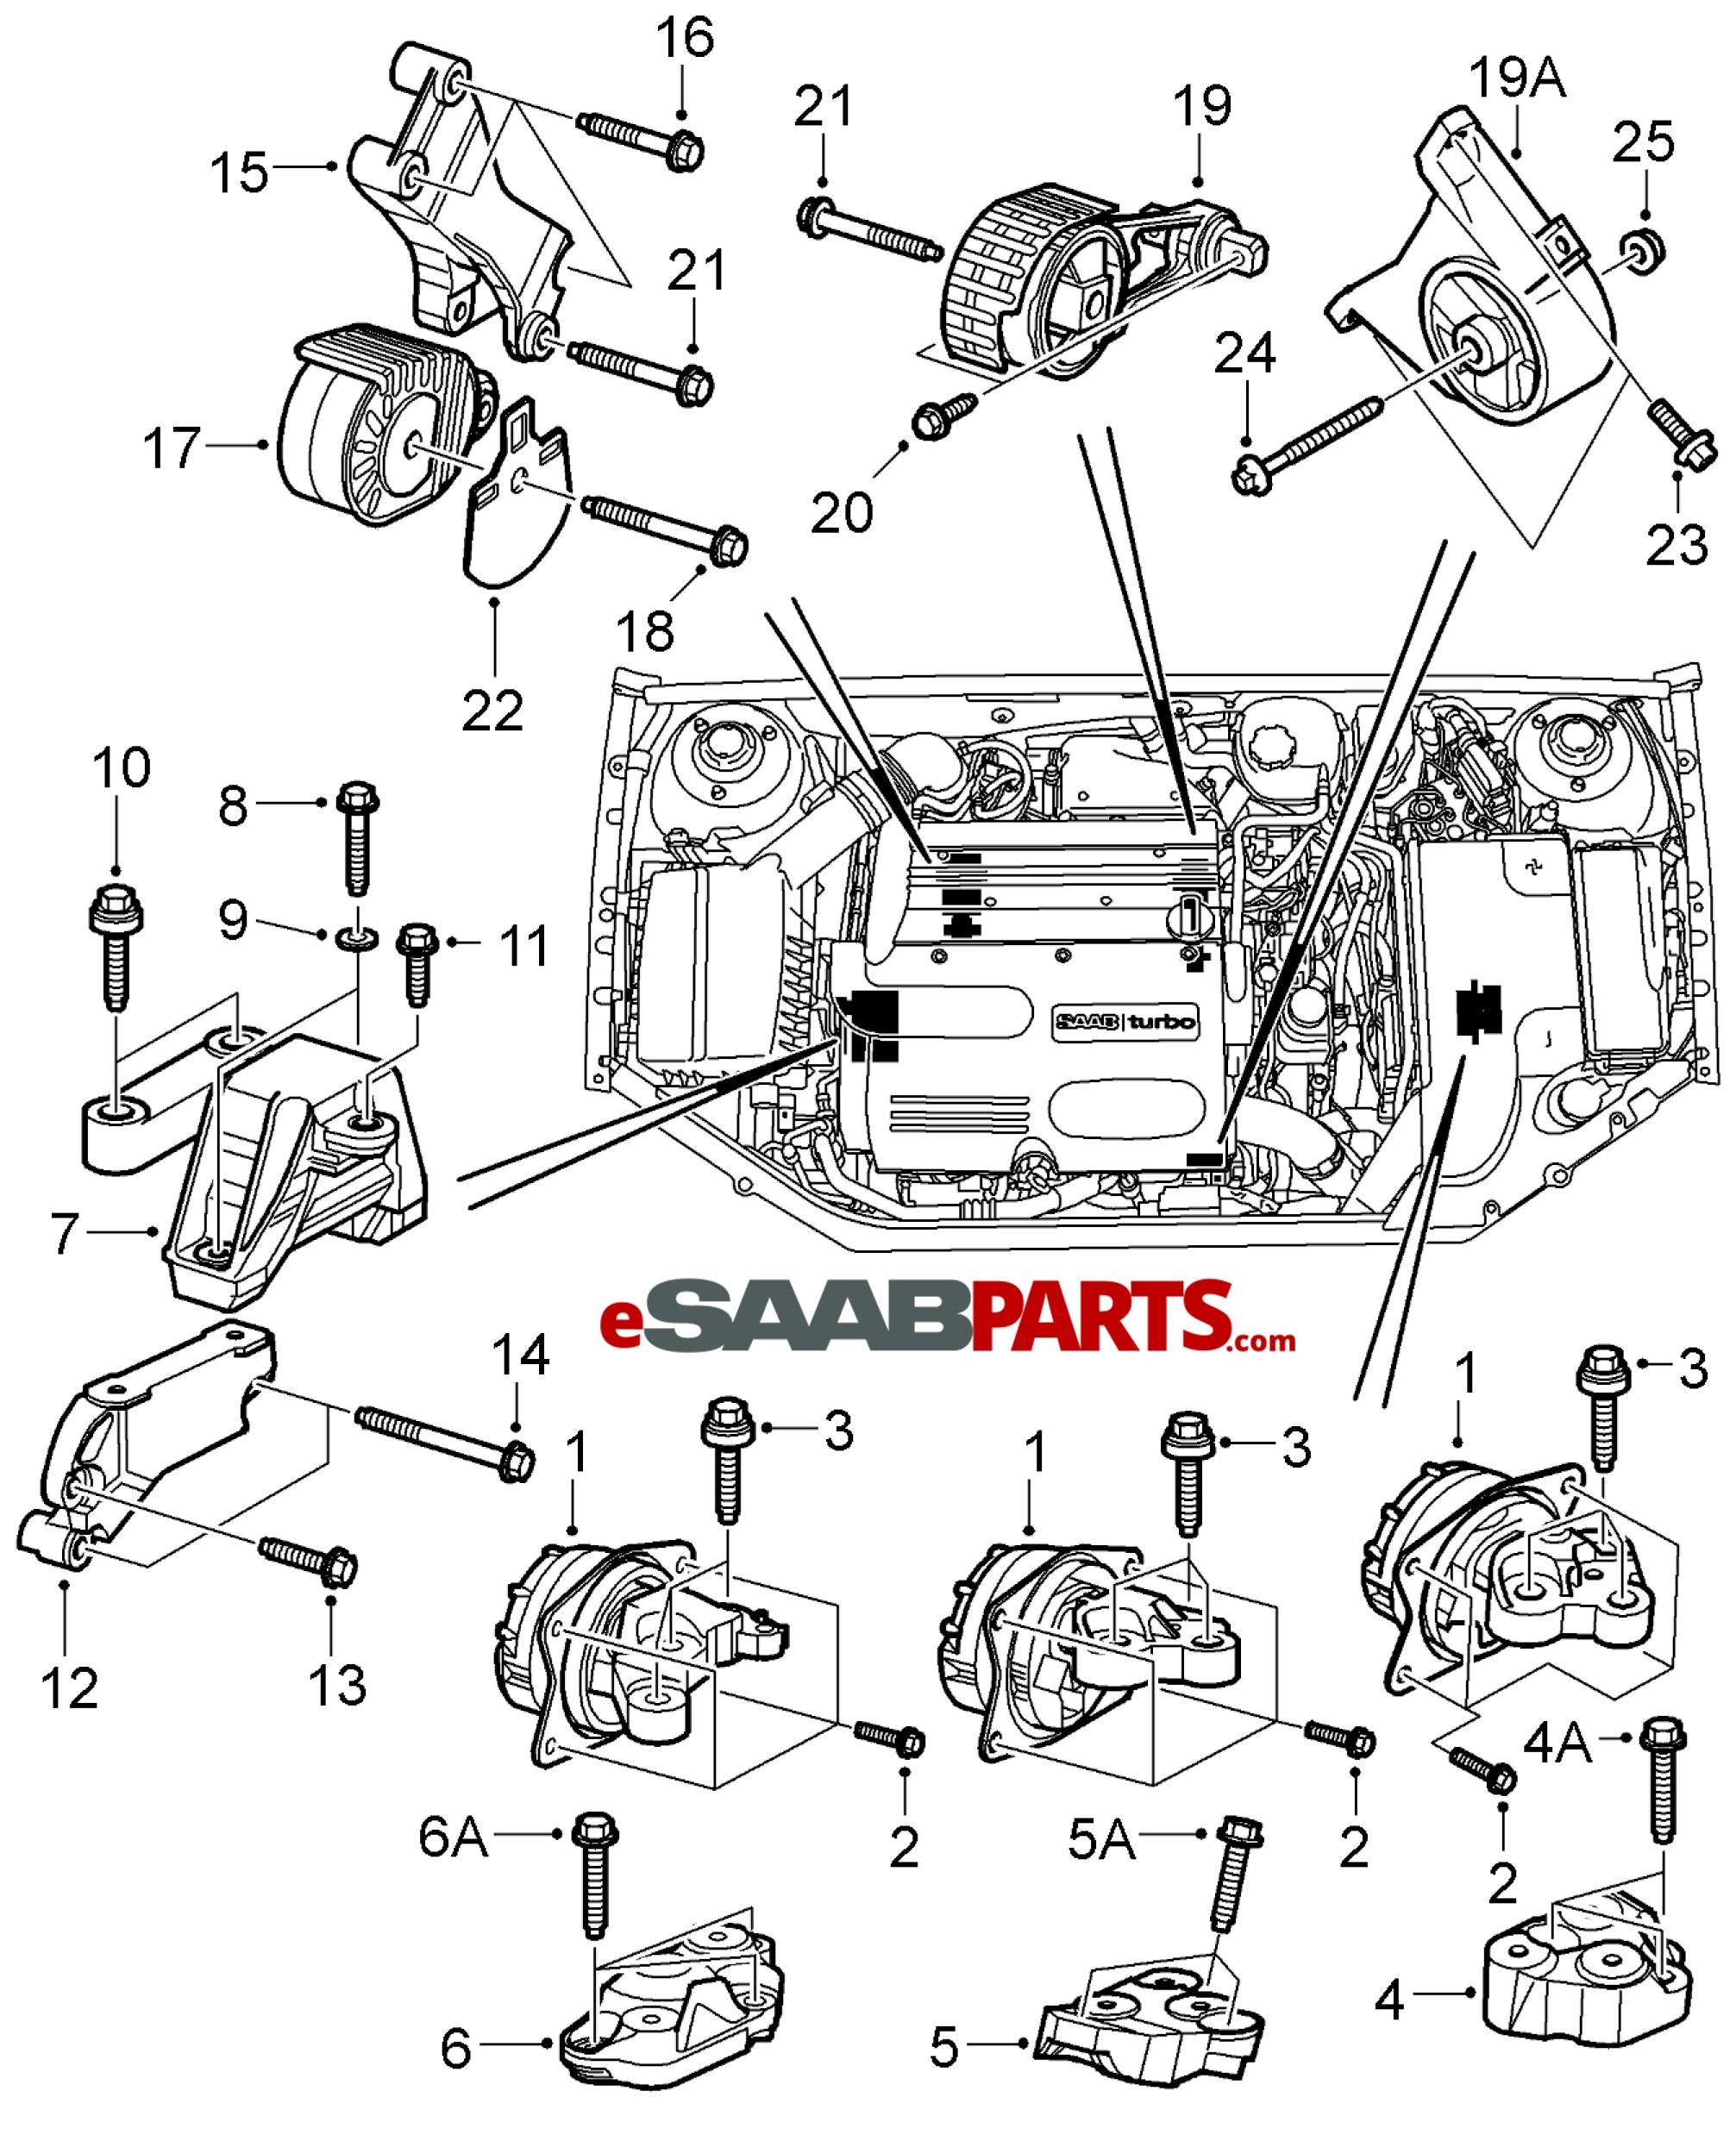 Saab 9 5 Engine Diagram 2 Saab Engine Bay Diagram Layout Wiring Diagrams • Of Saab 9 5 Engine Diagram 2